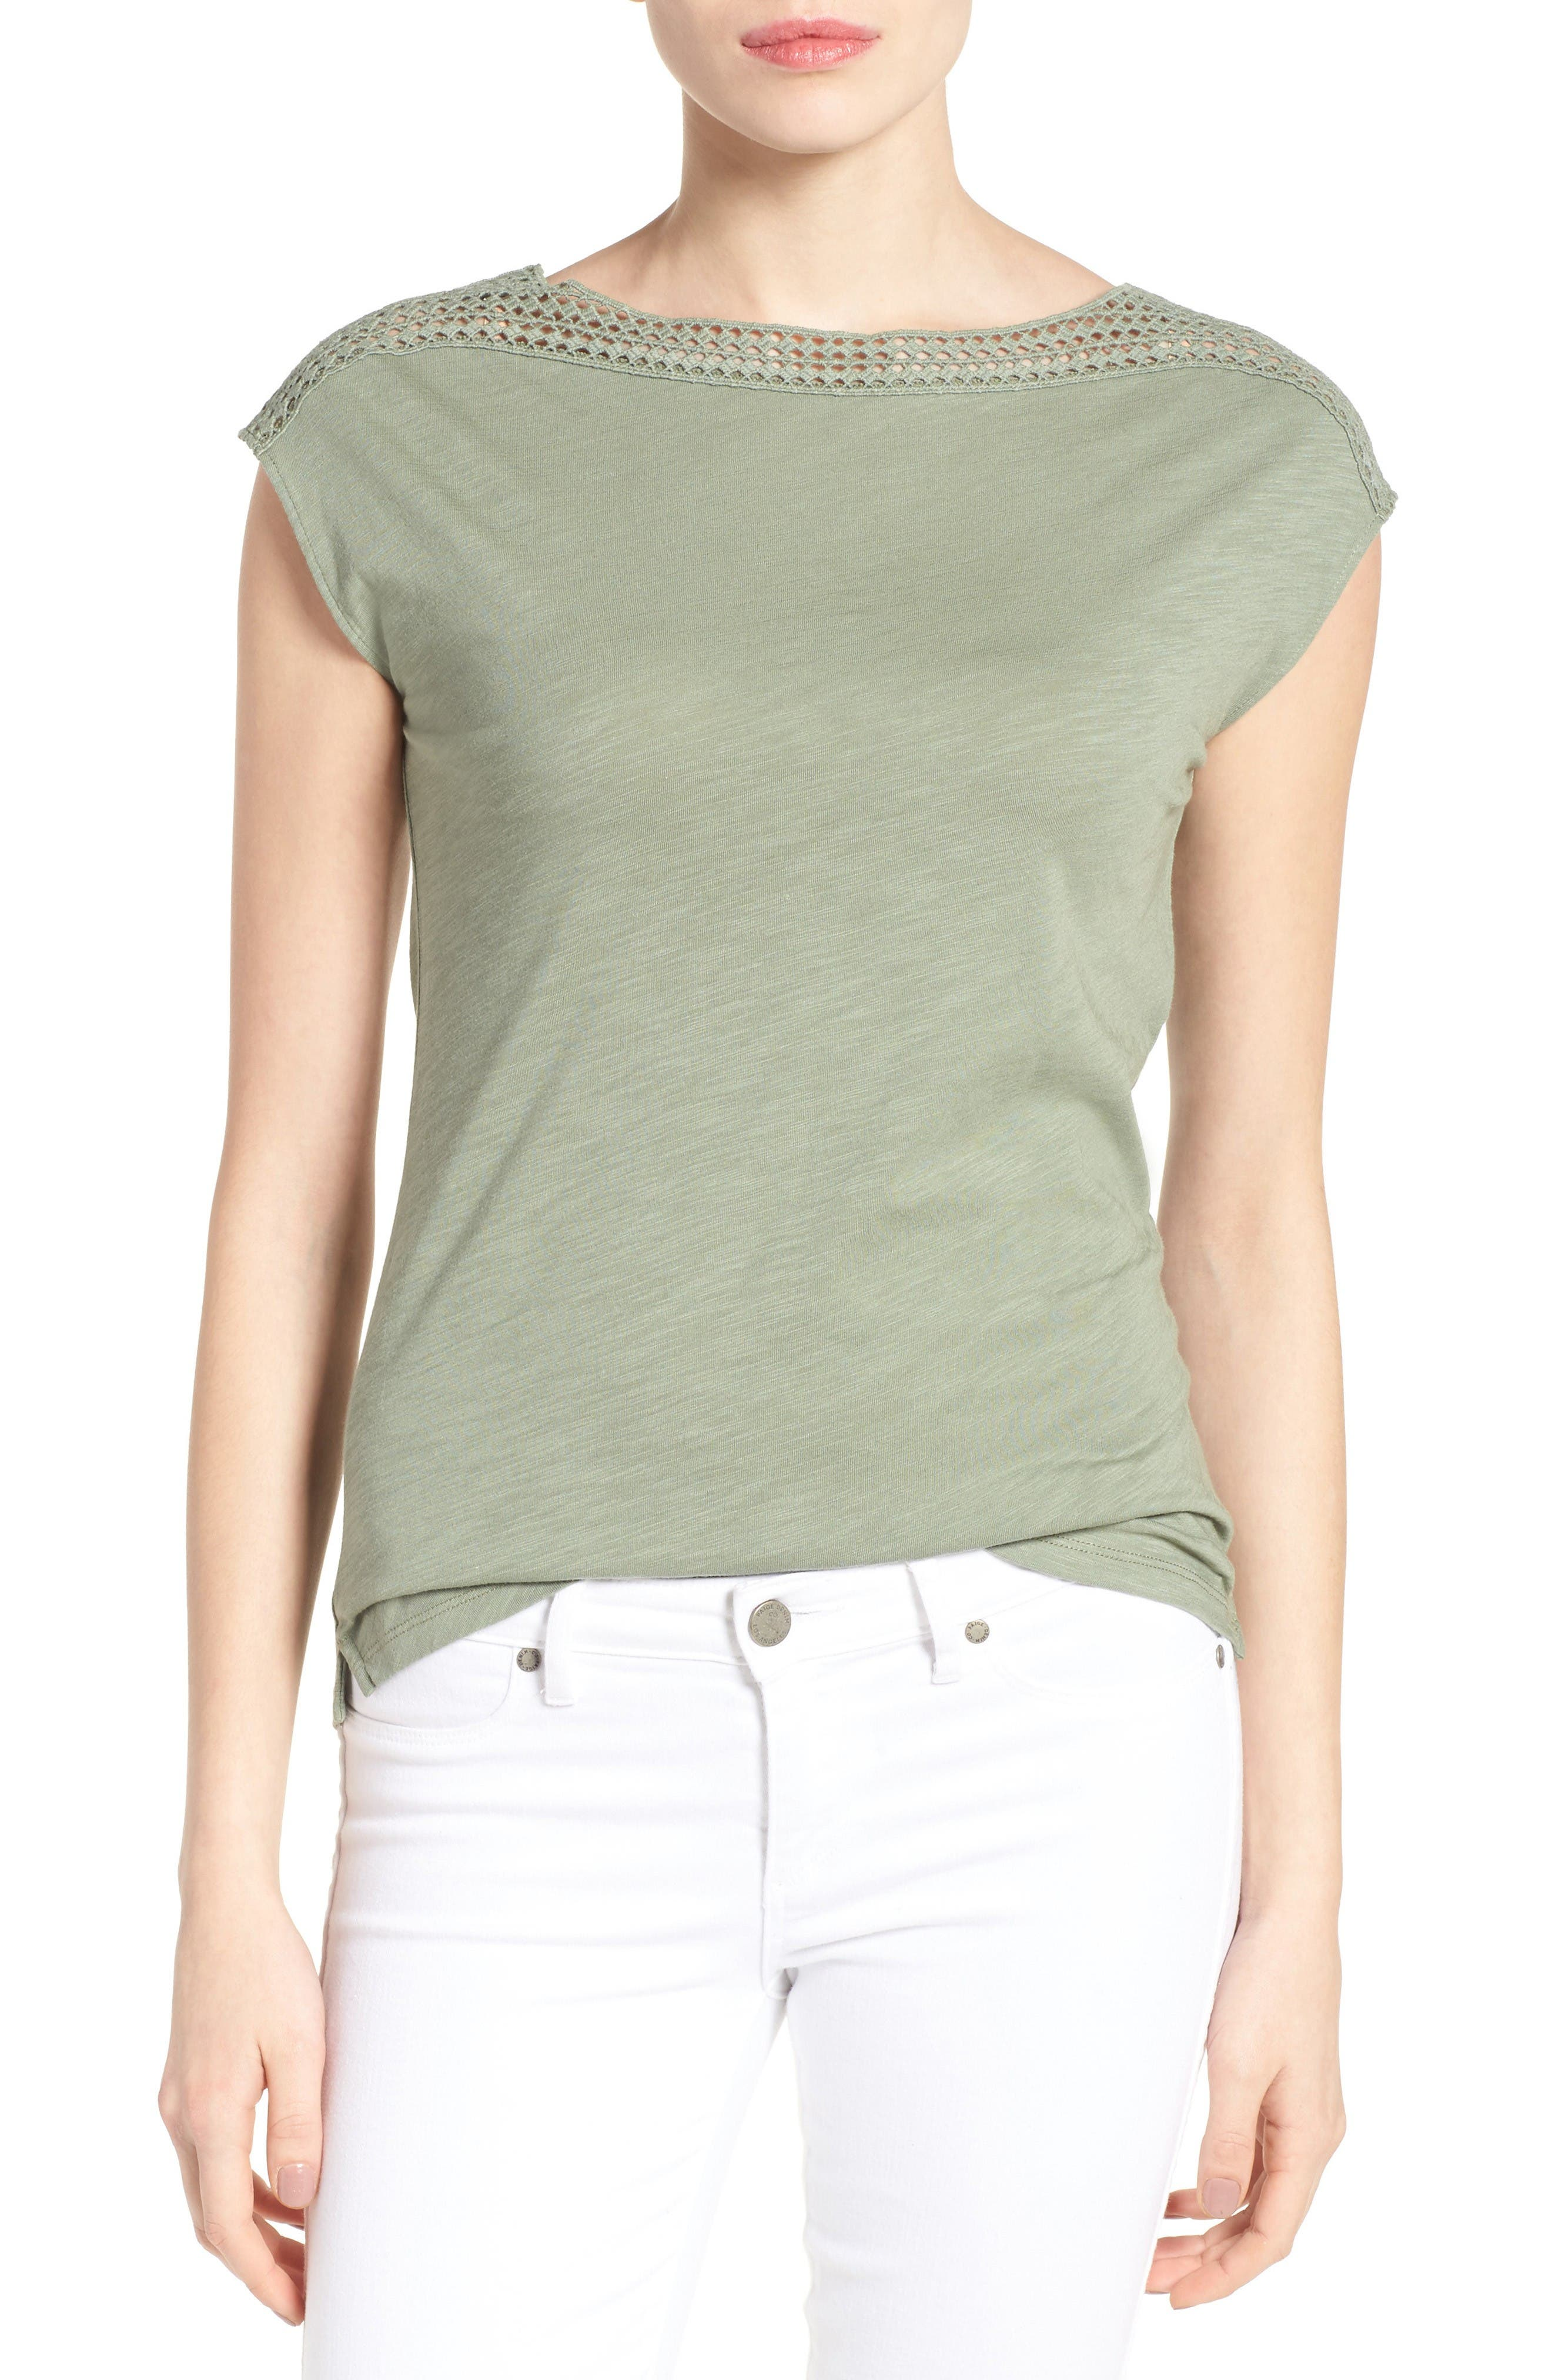 Alternate Image 1 Selected - Caslon® Lace Shoulder Tee (Regular & Petite)